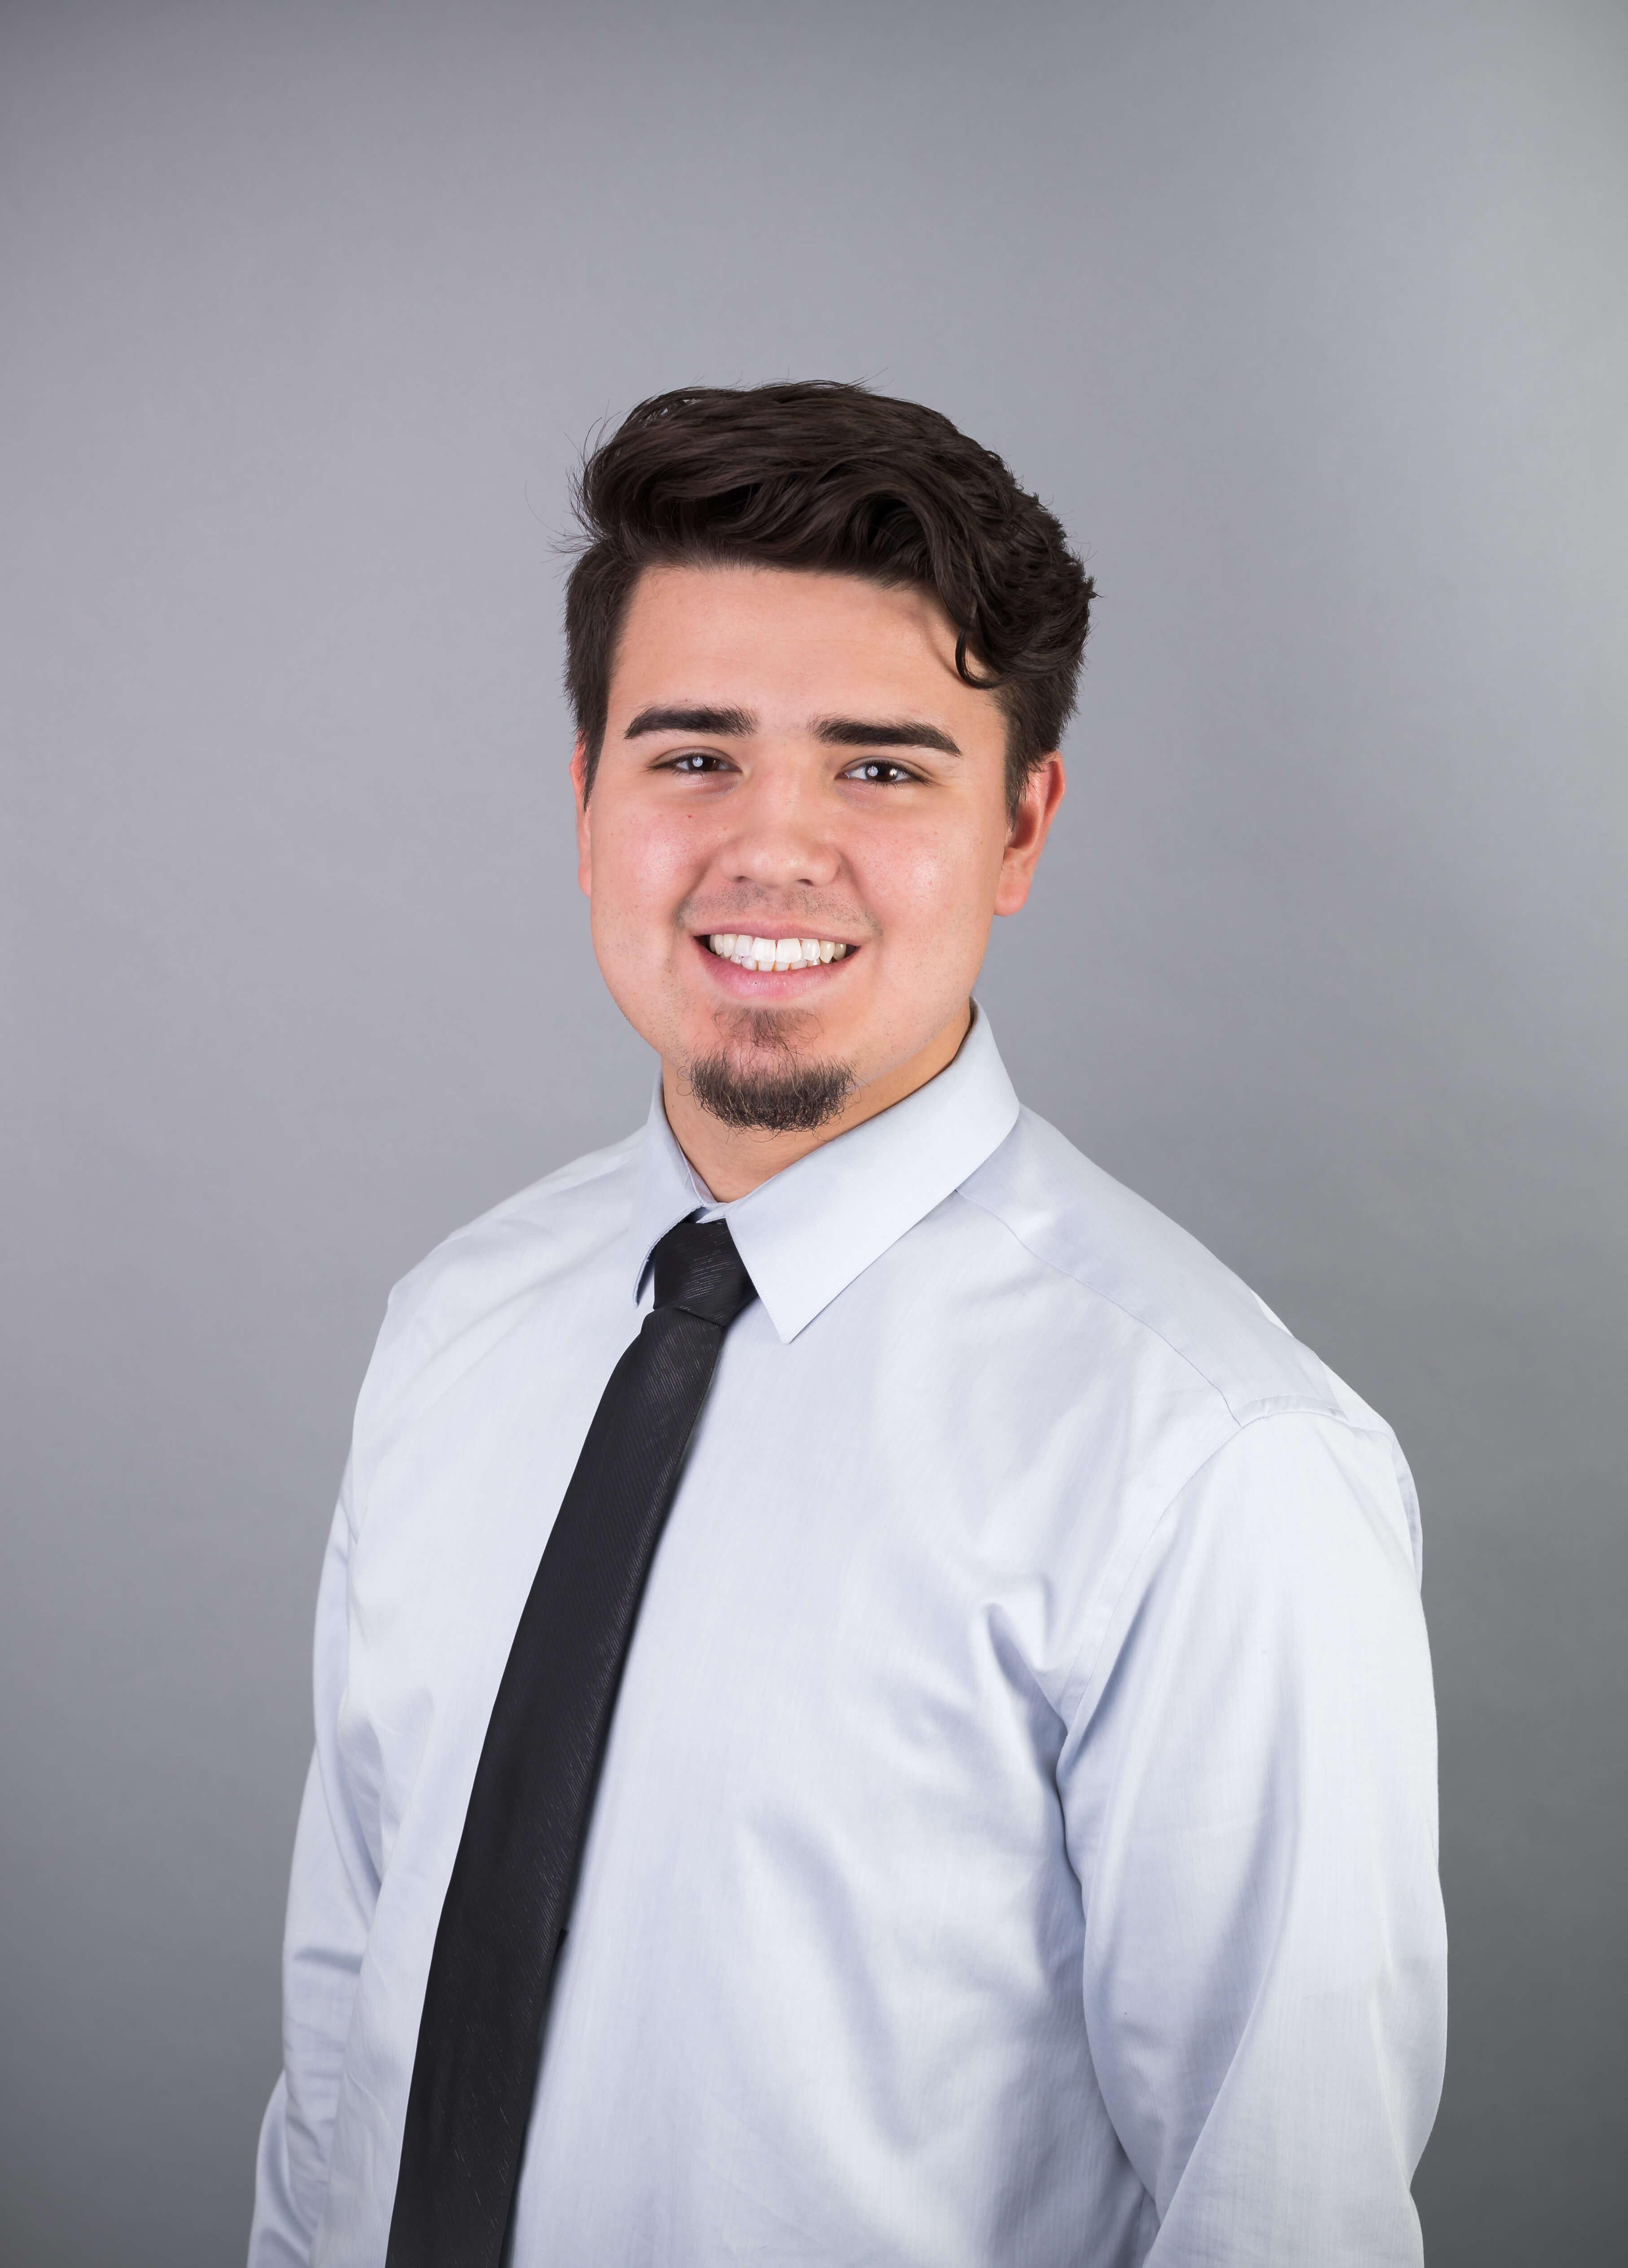 Jacob Charfauros